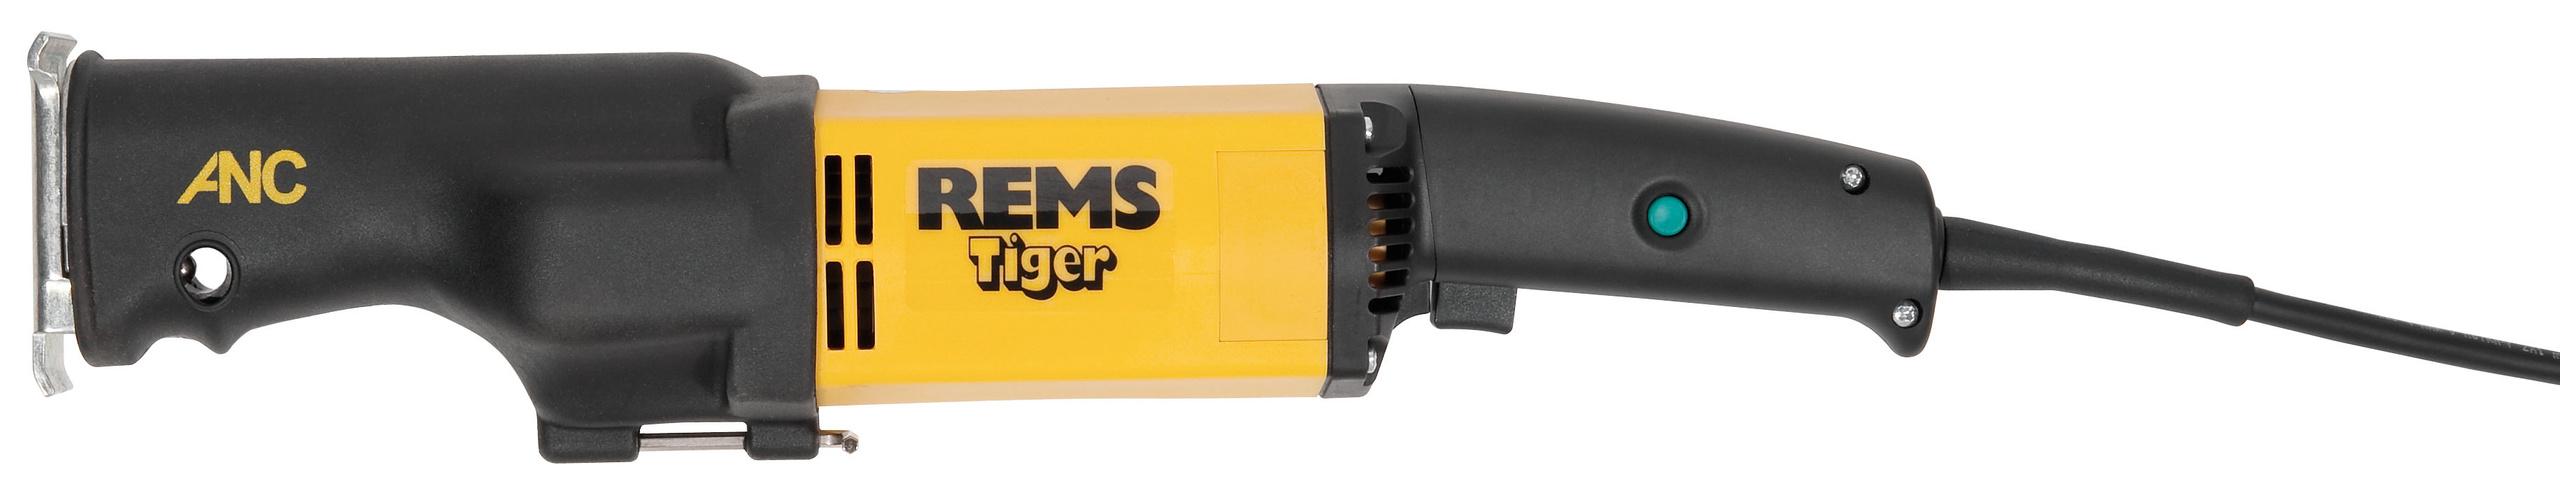 <br/>REMS Tiger ANC mach. entr.